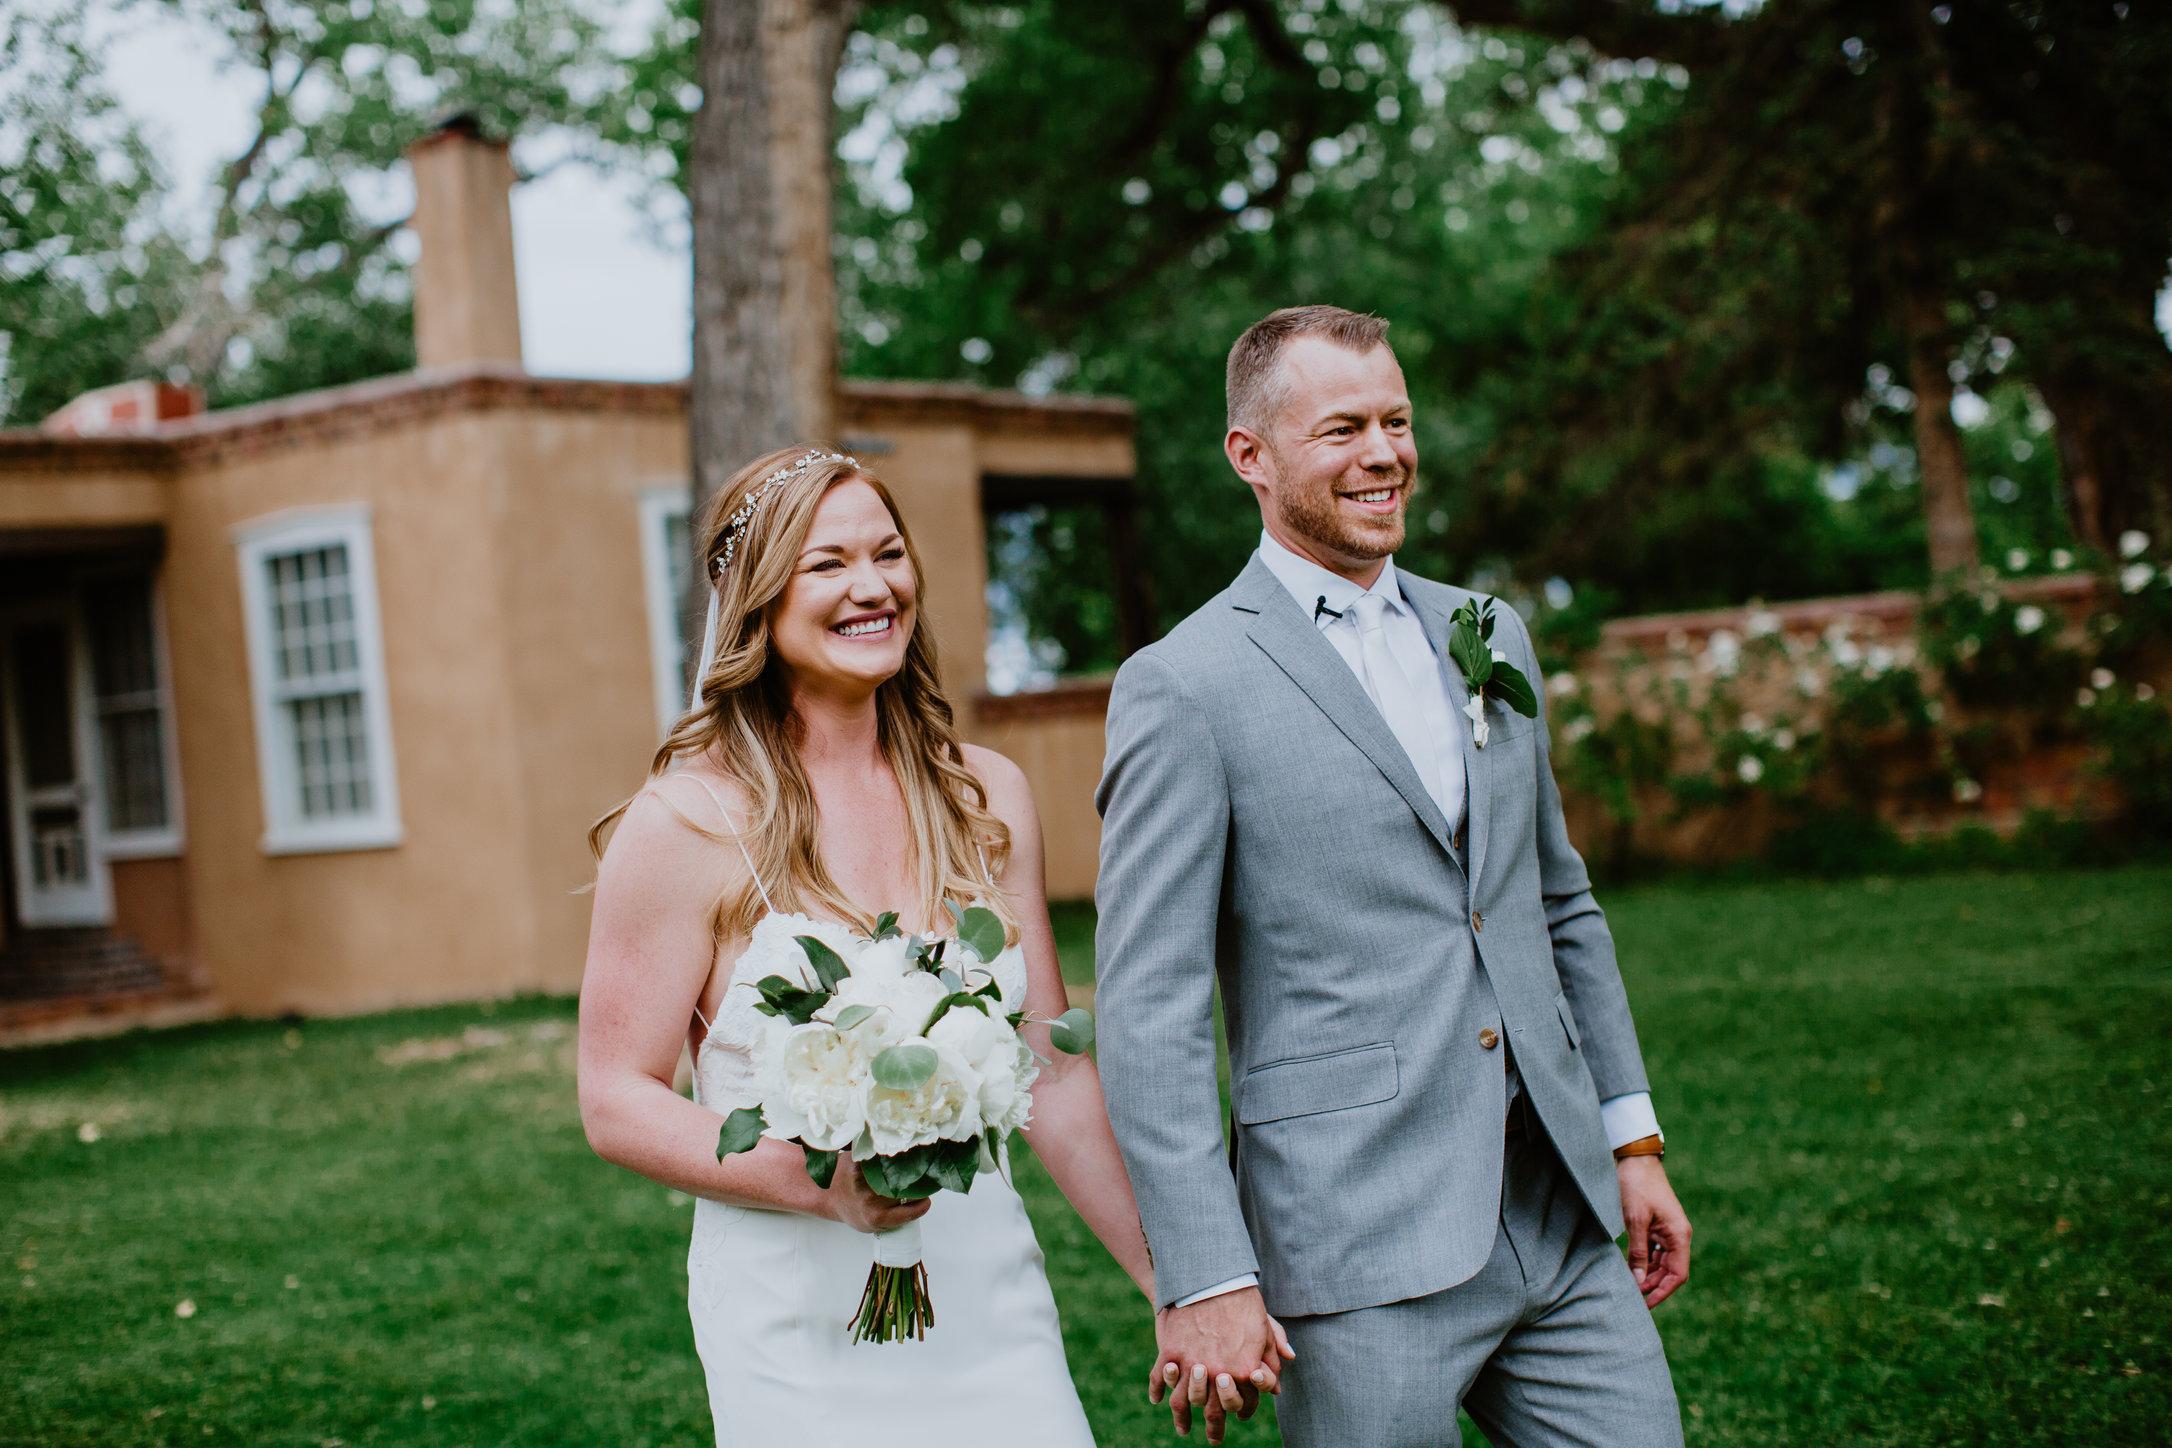 DandA-wedding-340.jpg